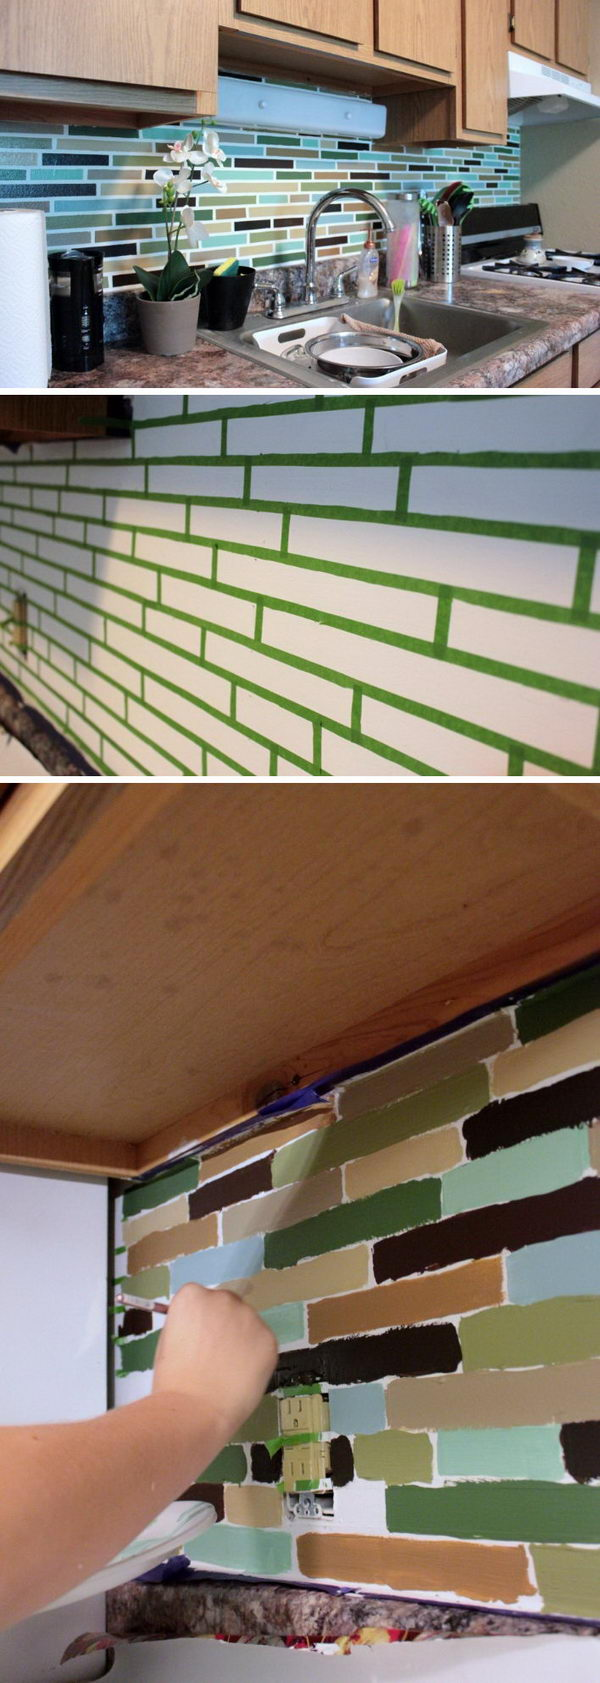 Mosaic Tile Paint Backsplash.